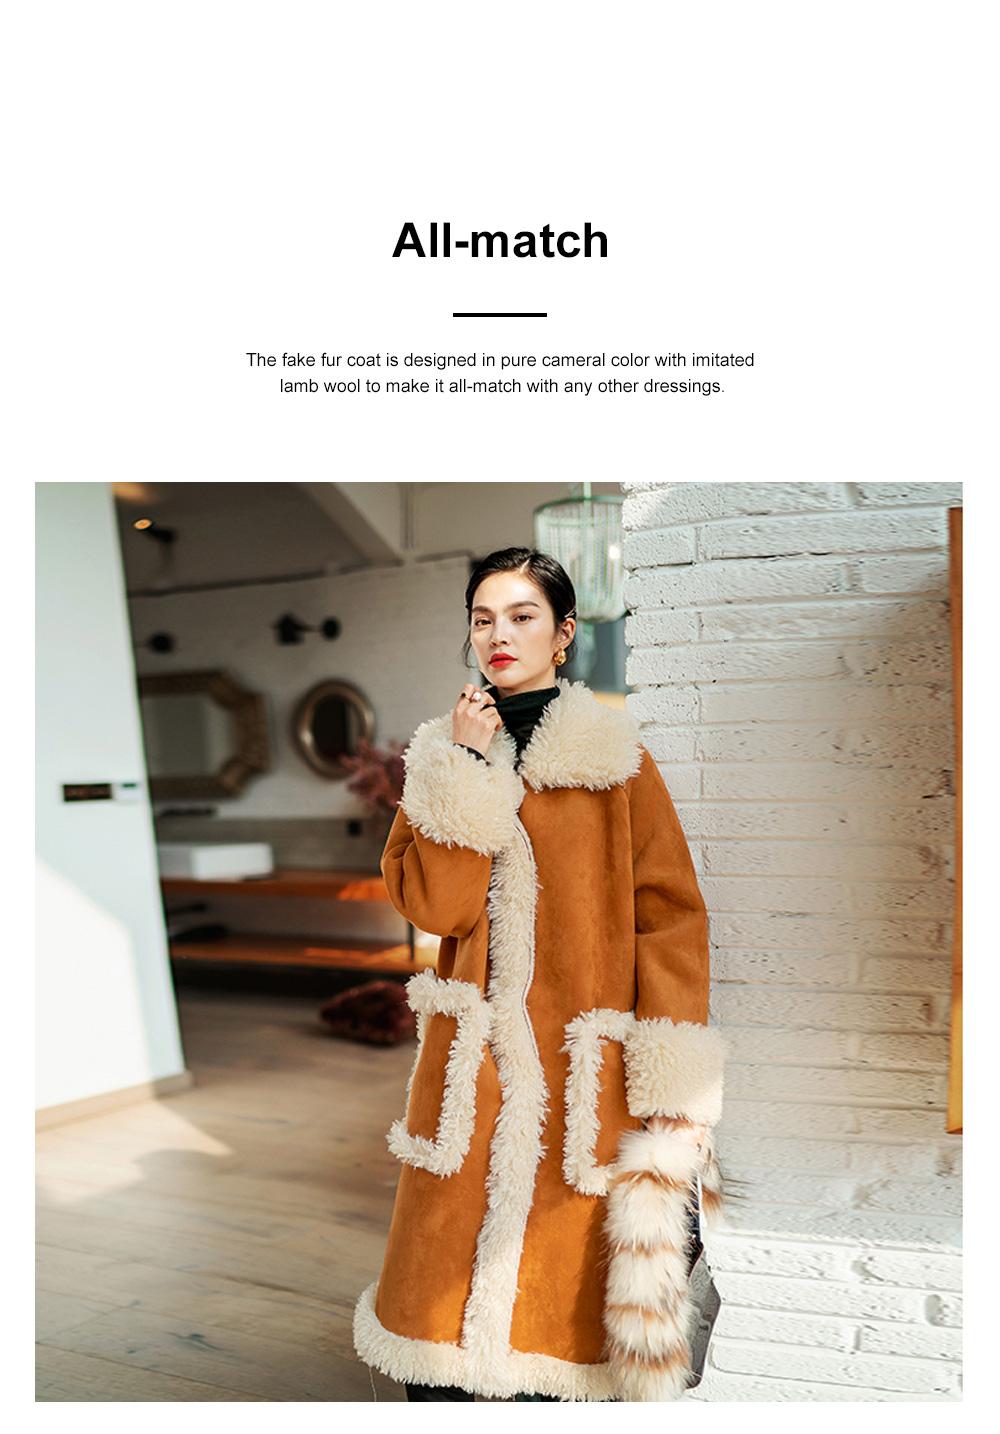 Fake Fur Long Coat for Women Wear Imitated Lamb Wool Great Coat Autumn Winter 2019 1